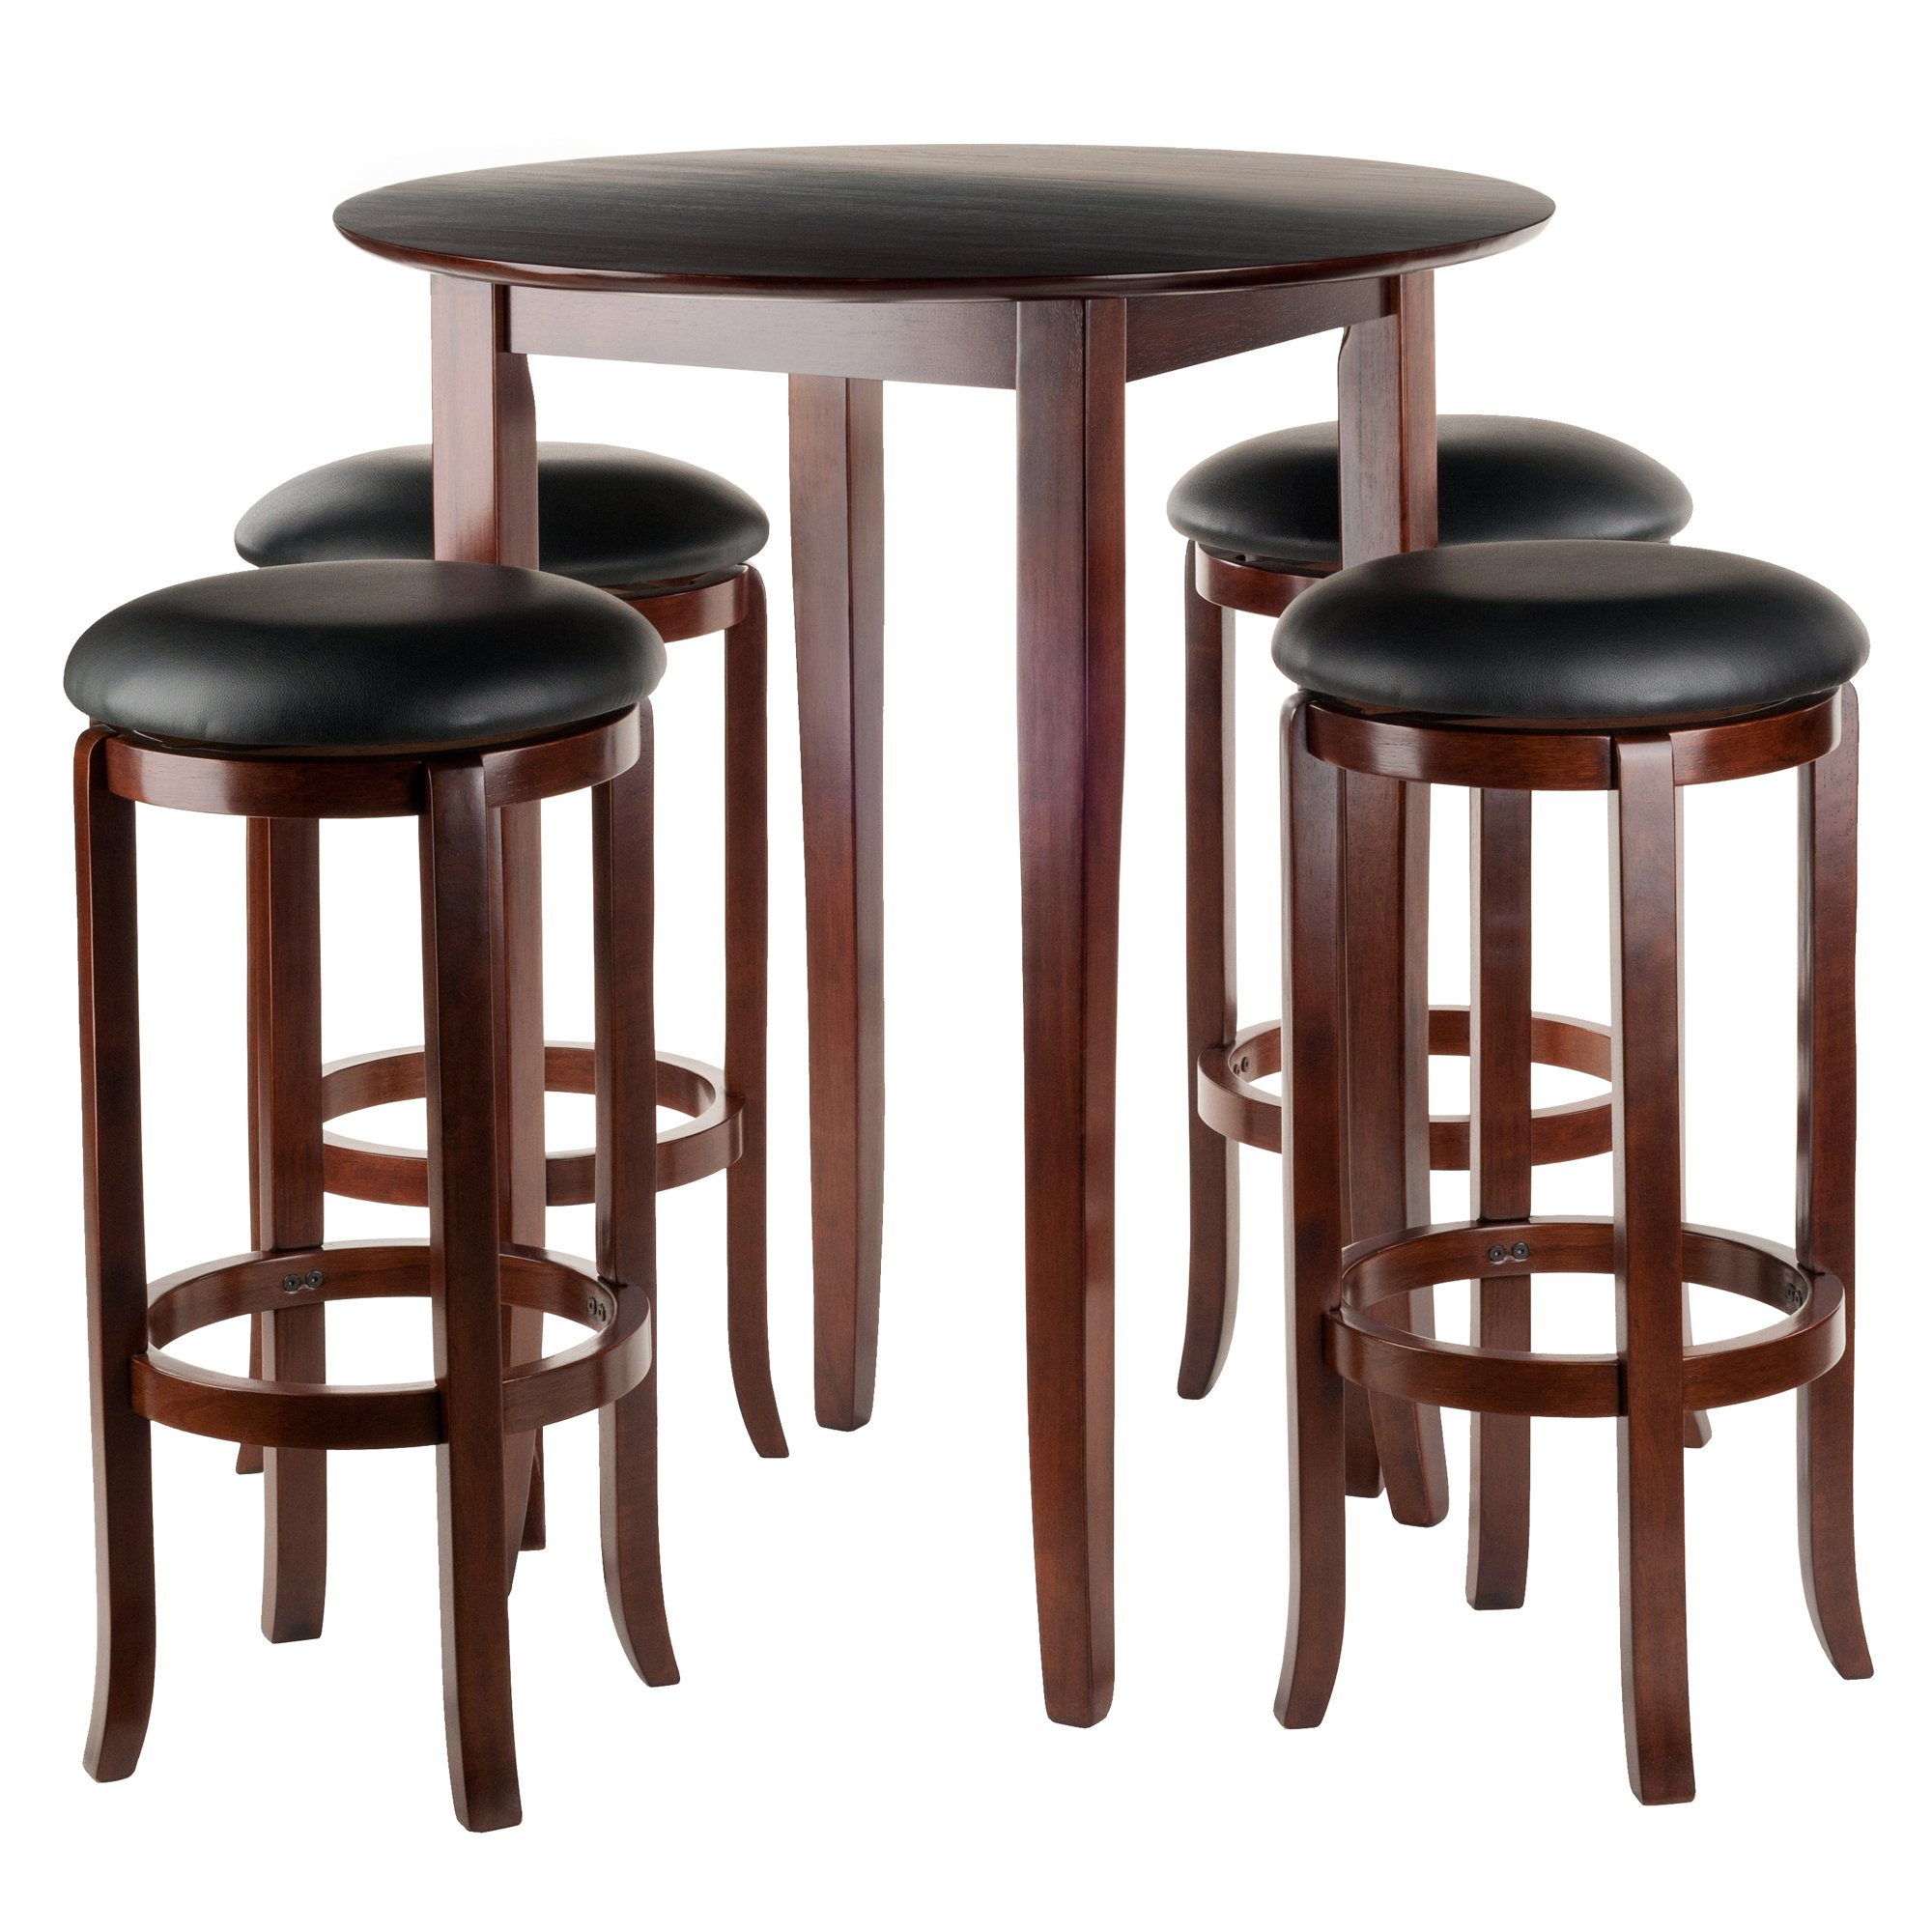 Rectangular Pub Tables Amazon Com: Pub Tables And Chairs: Amazon.com